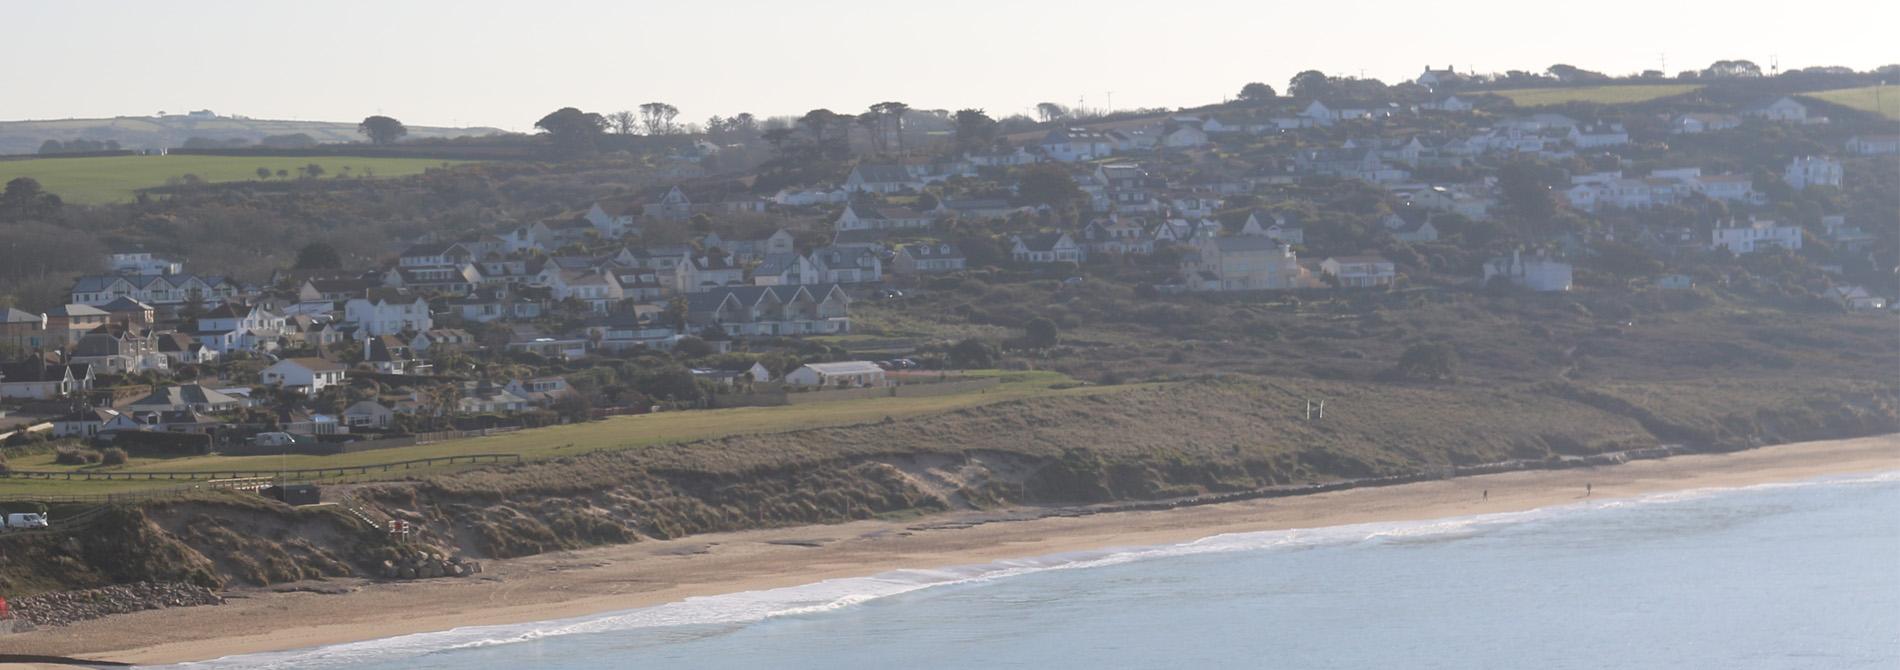 Surf and Coasteering School based at Praa Sands, Cornwall